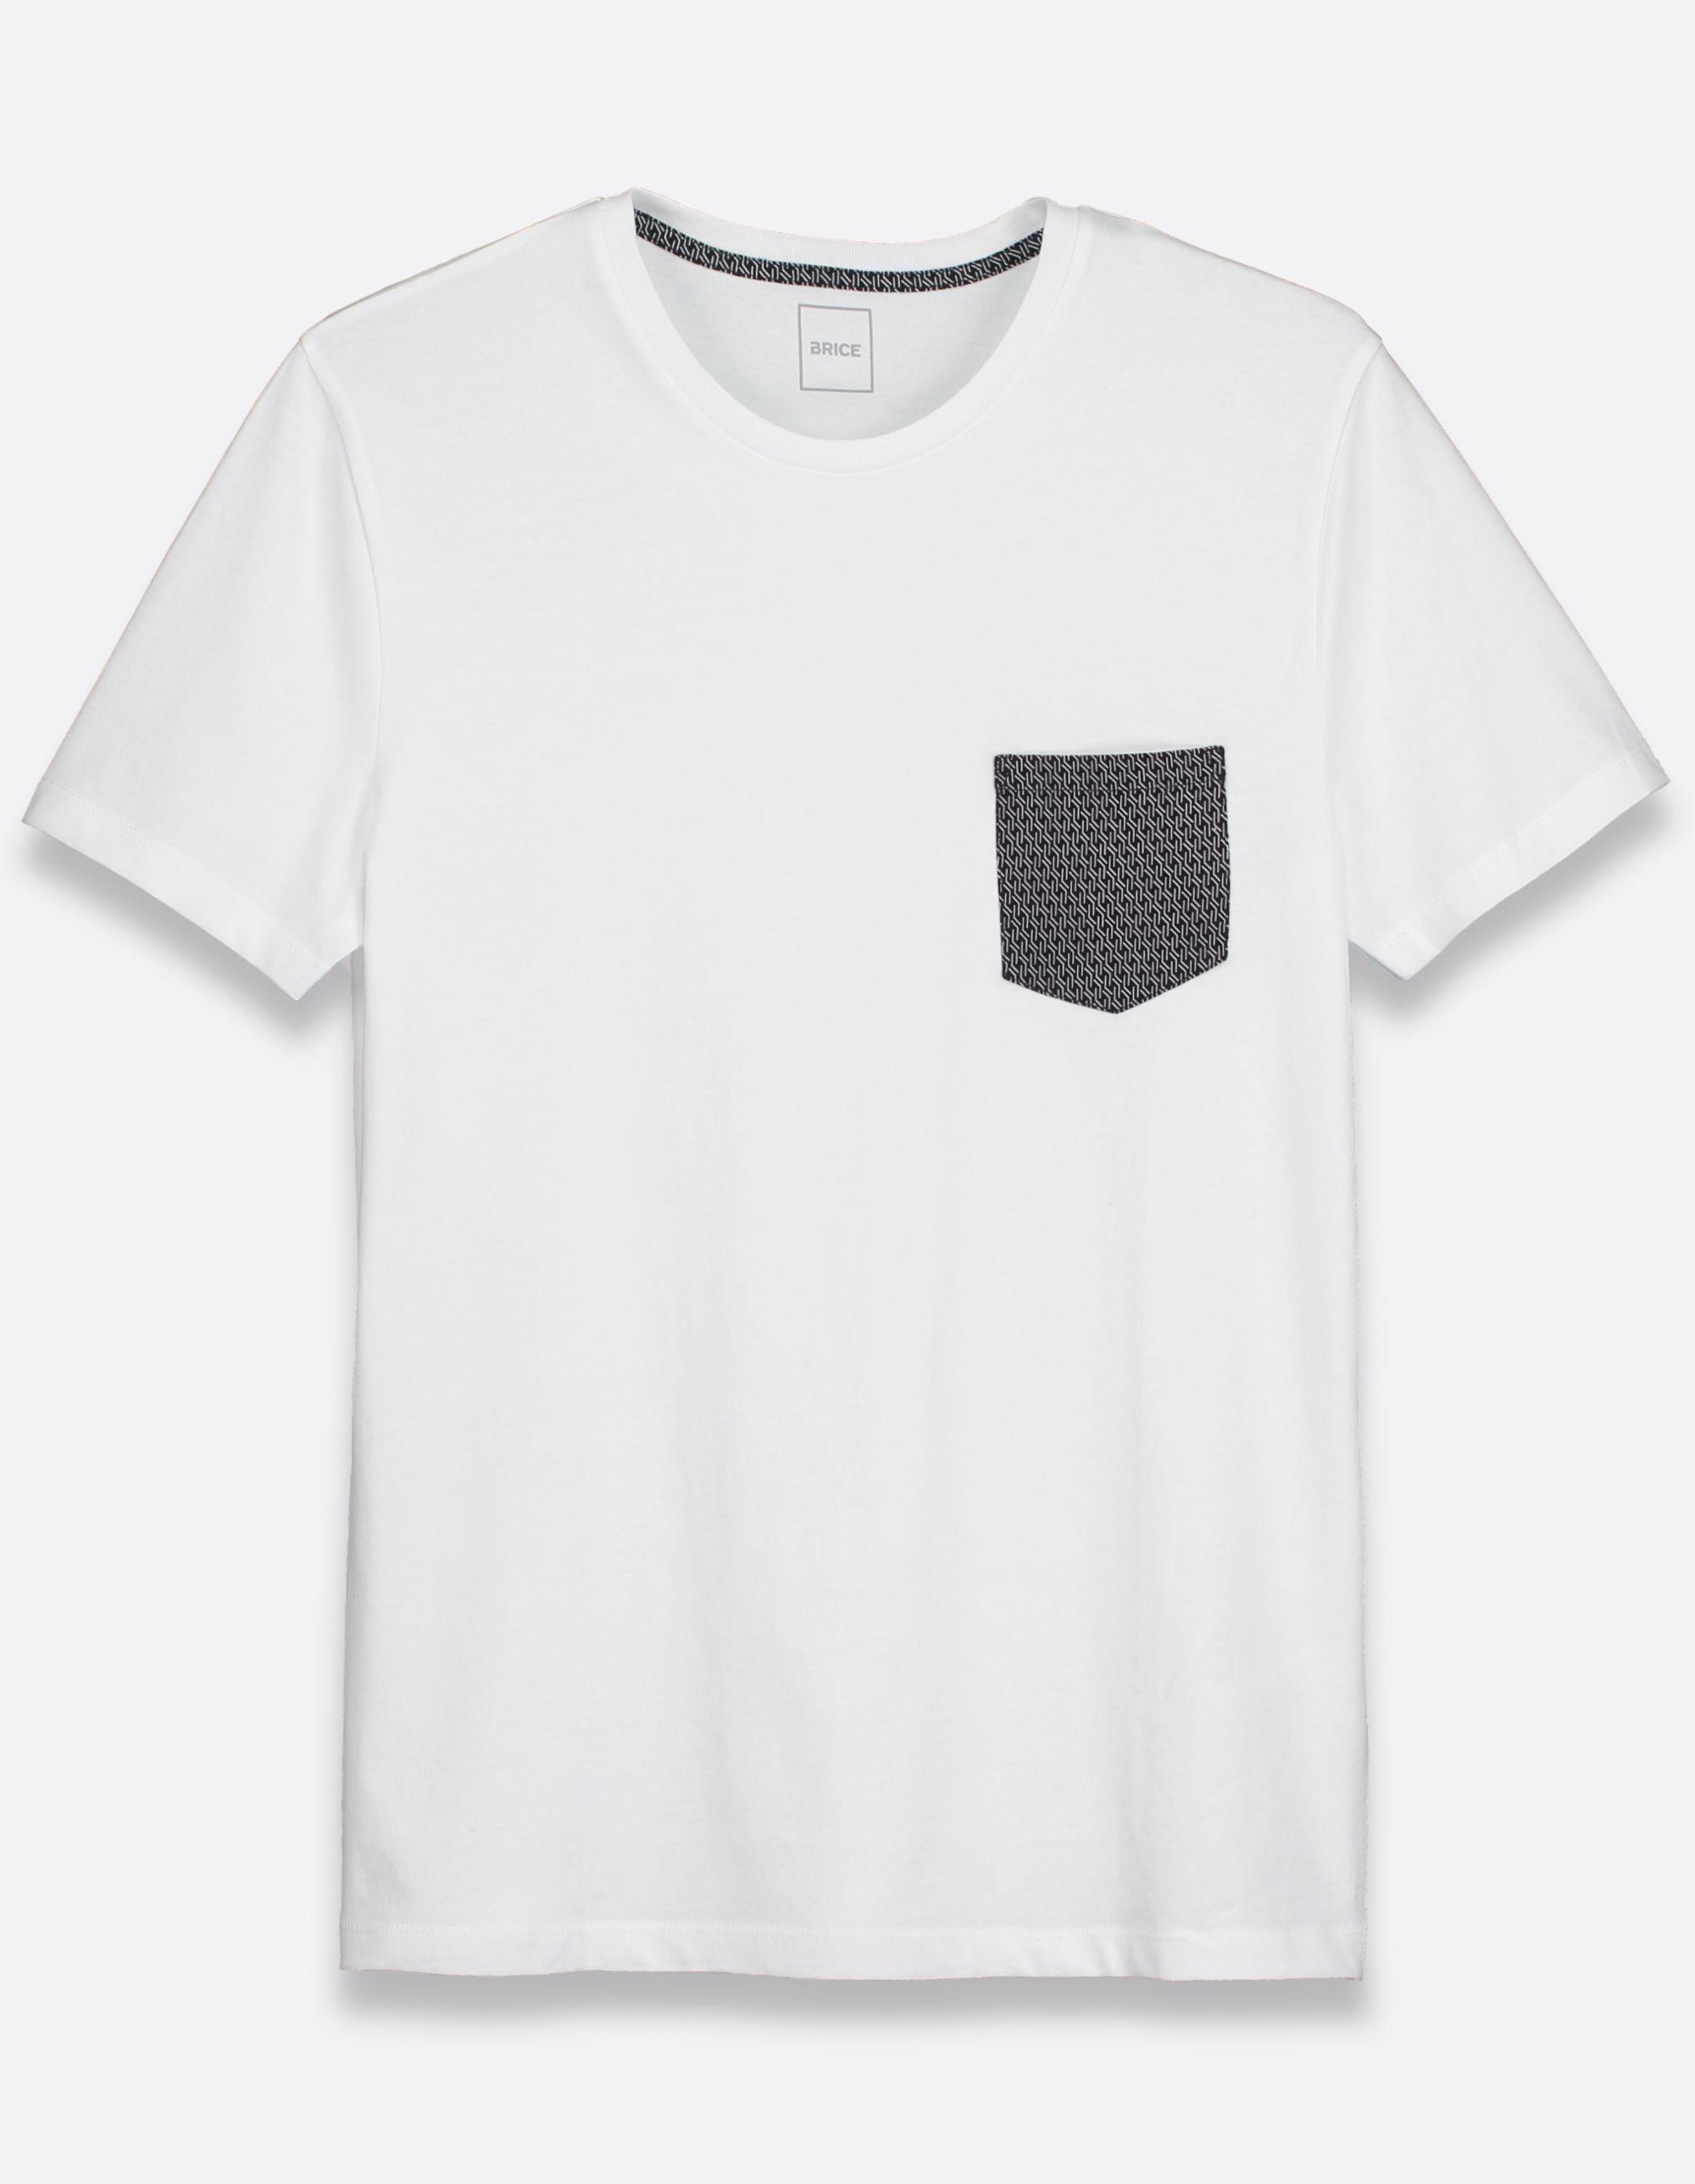 4eccbd06743 Tee-shirt homme blanc col rond uni - Brice